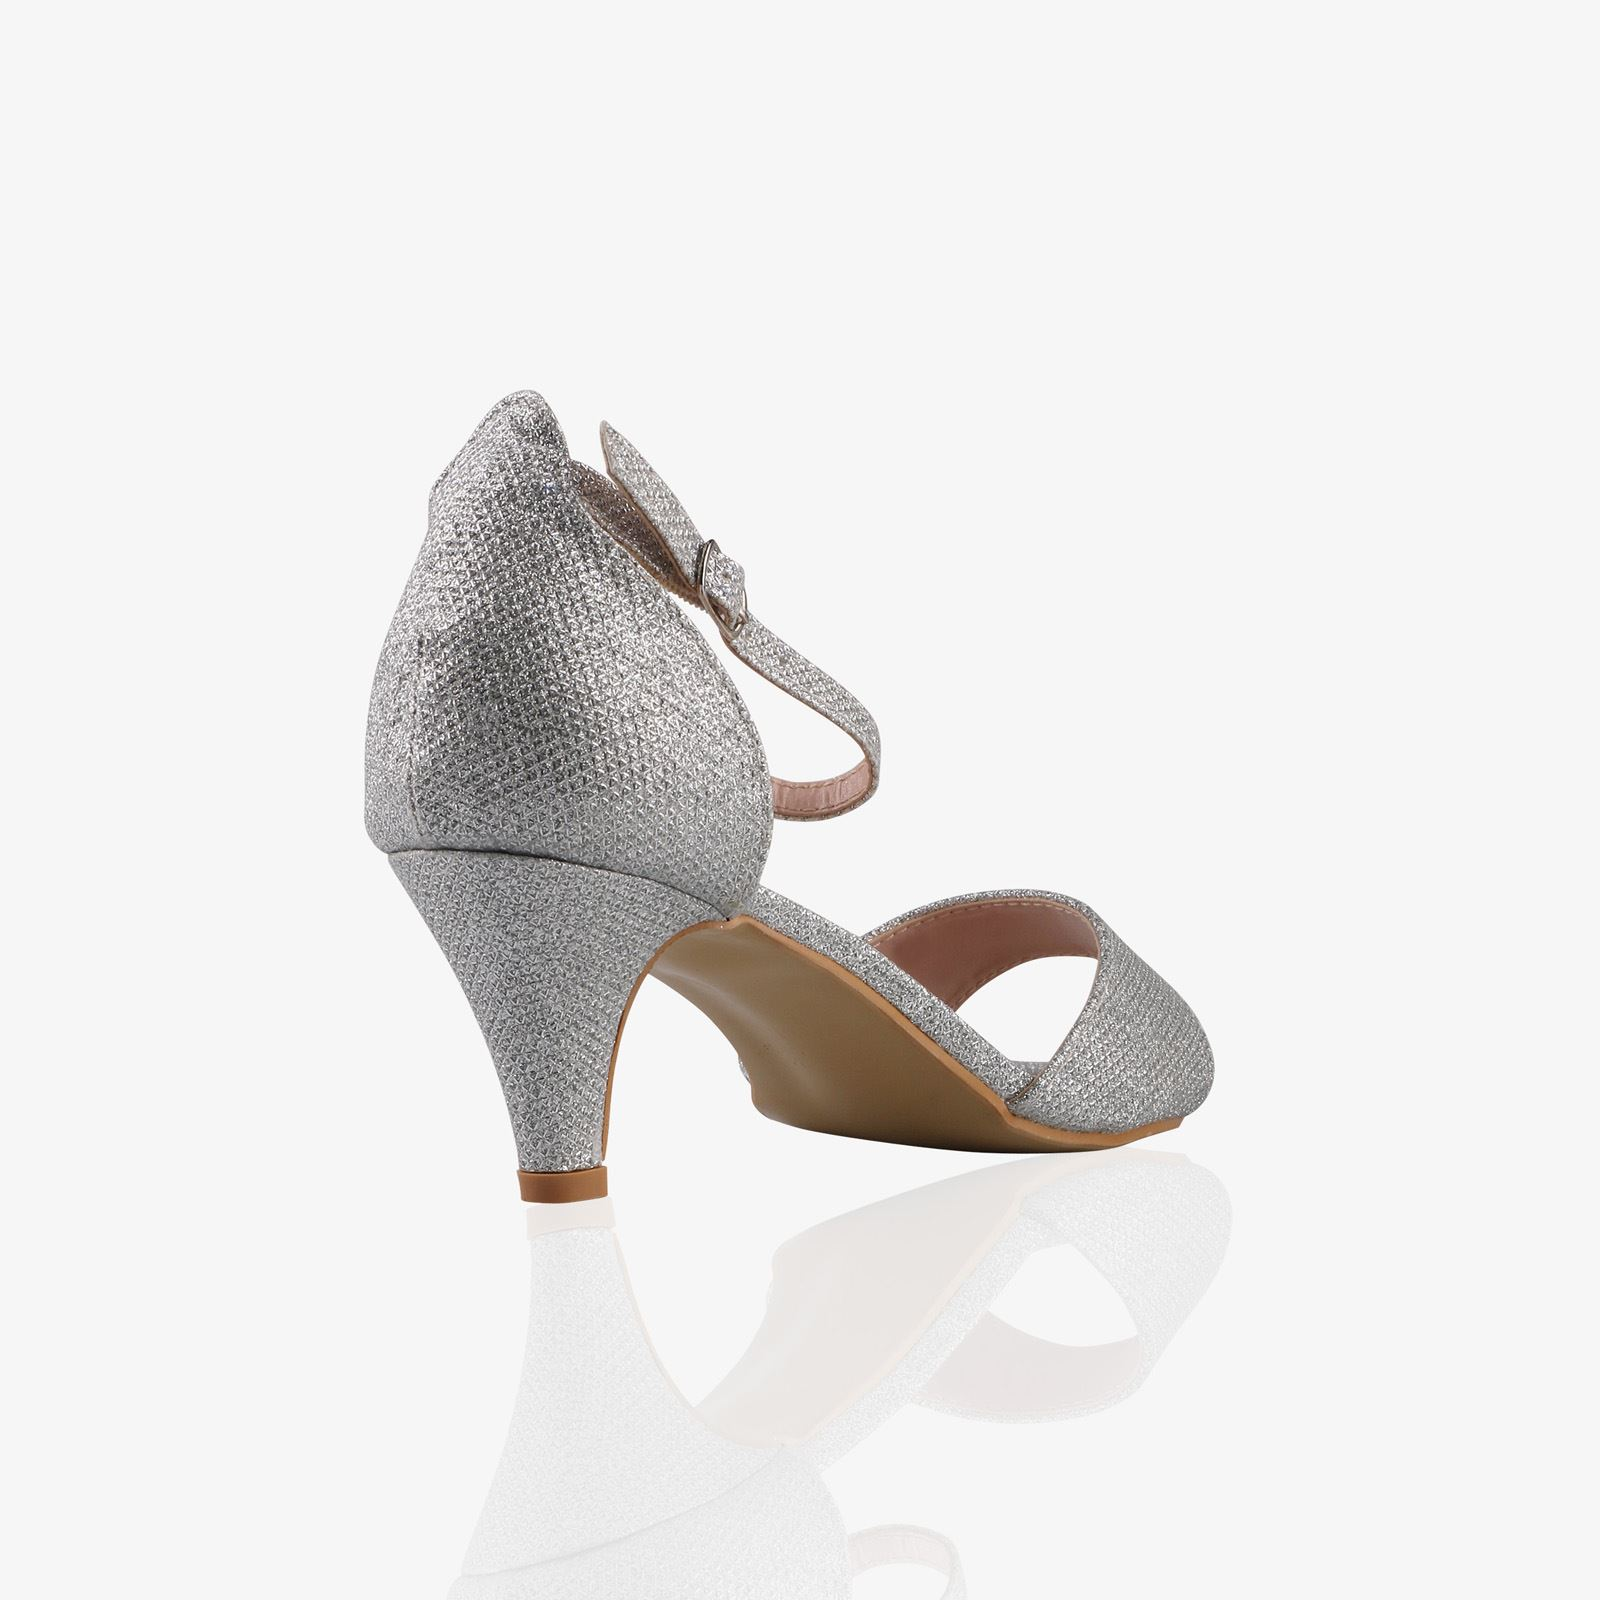 Women-Ladies-Low-Kitten-Heel-Court-Shoes-Open-Toe-Glitter-Sandals-Party-Bridal thumbnail 16